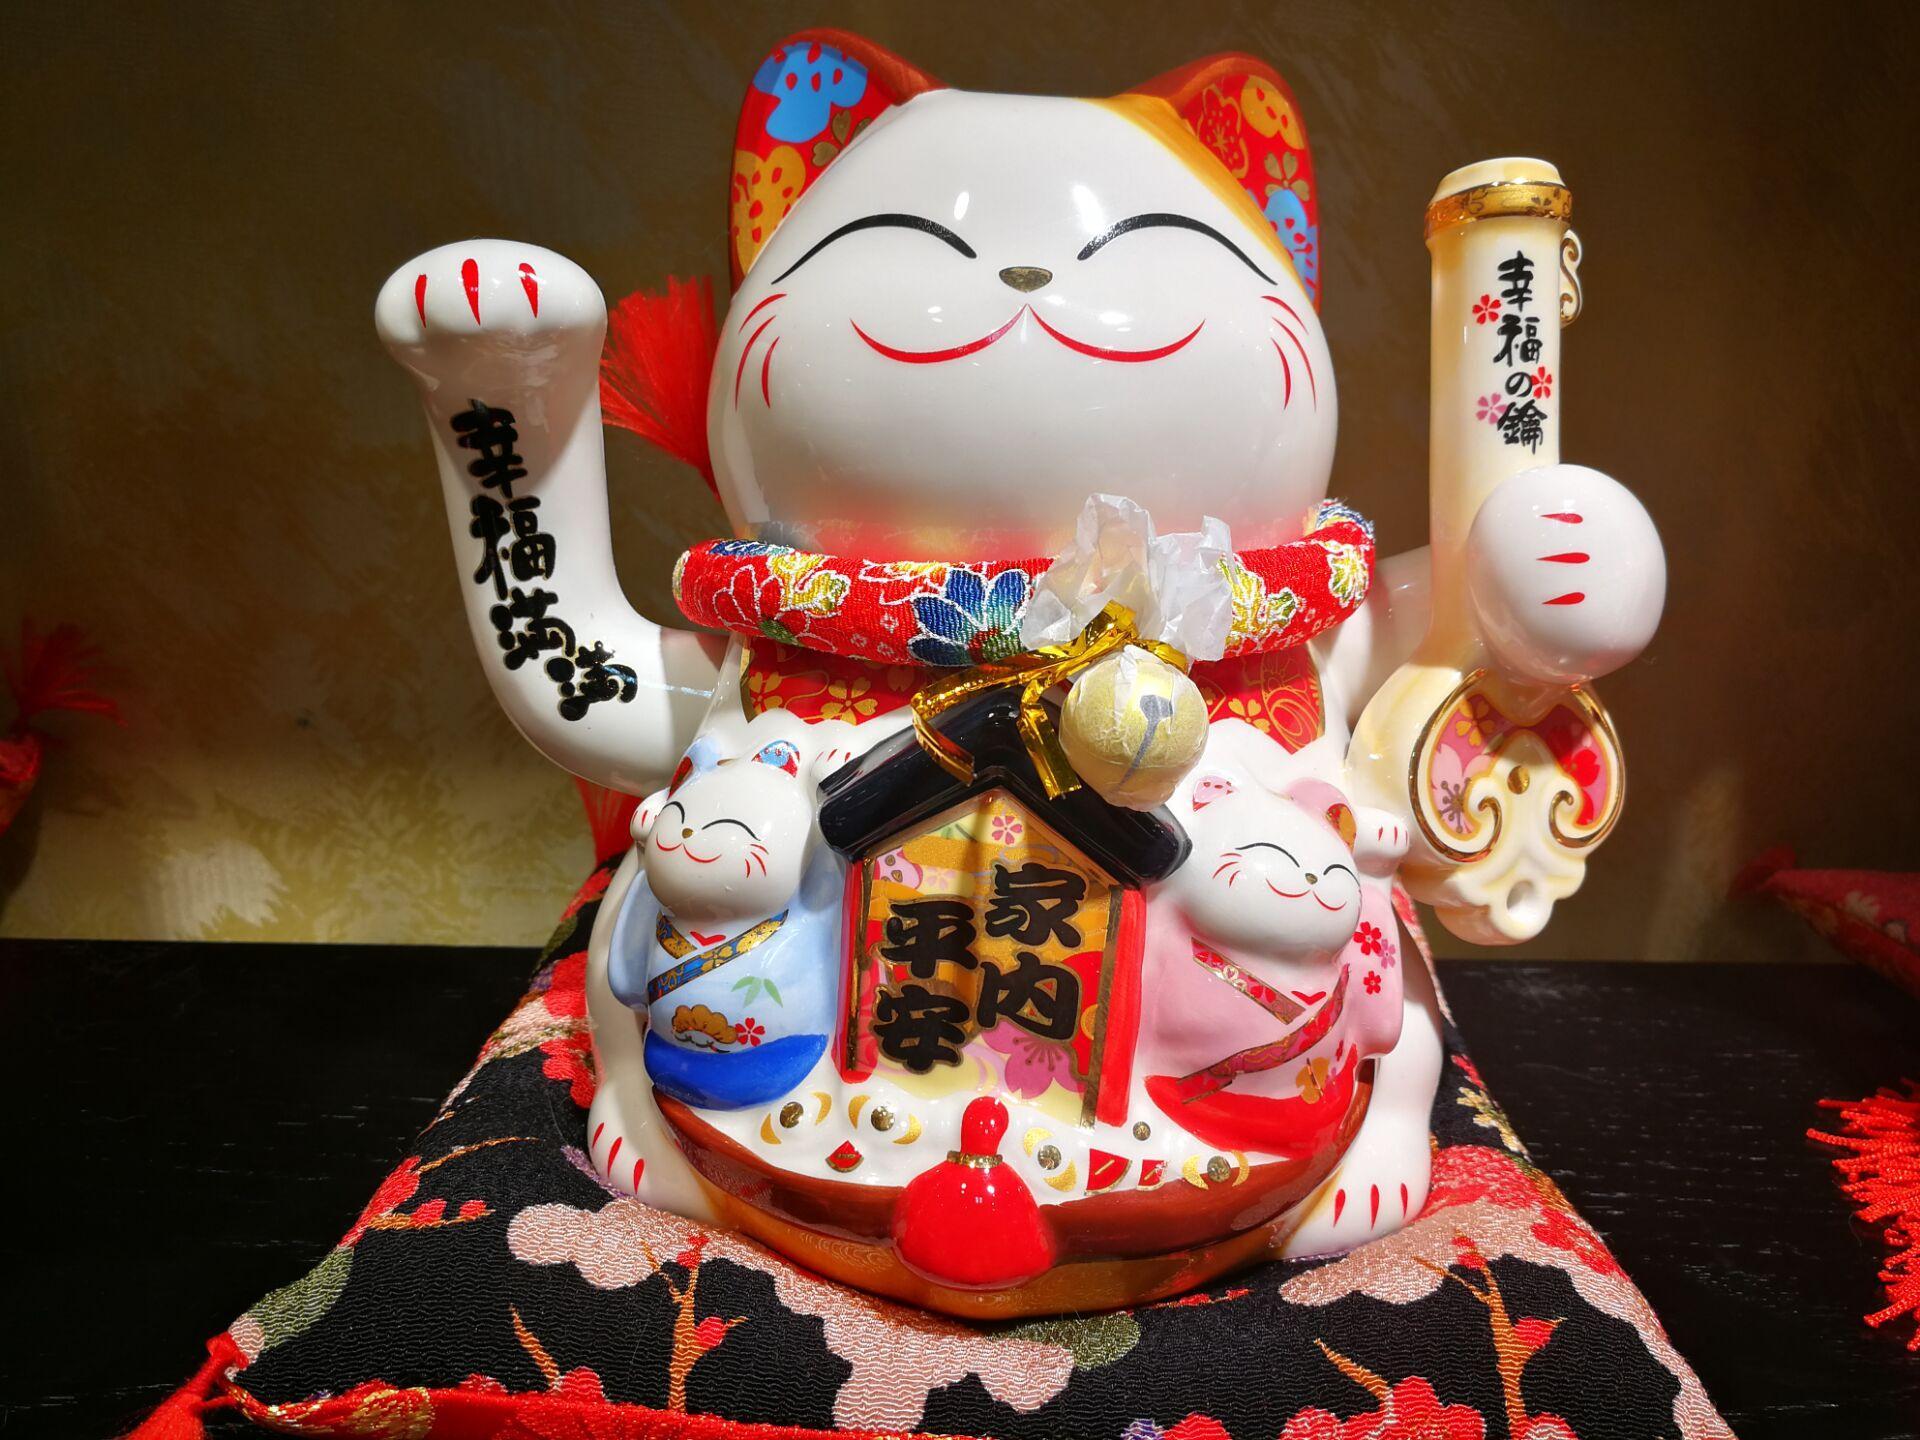 Kingstone Fortune Cat Ornament